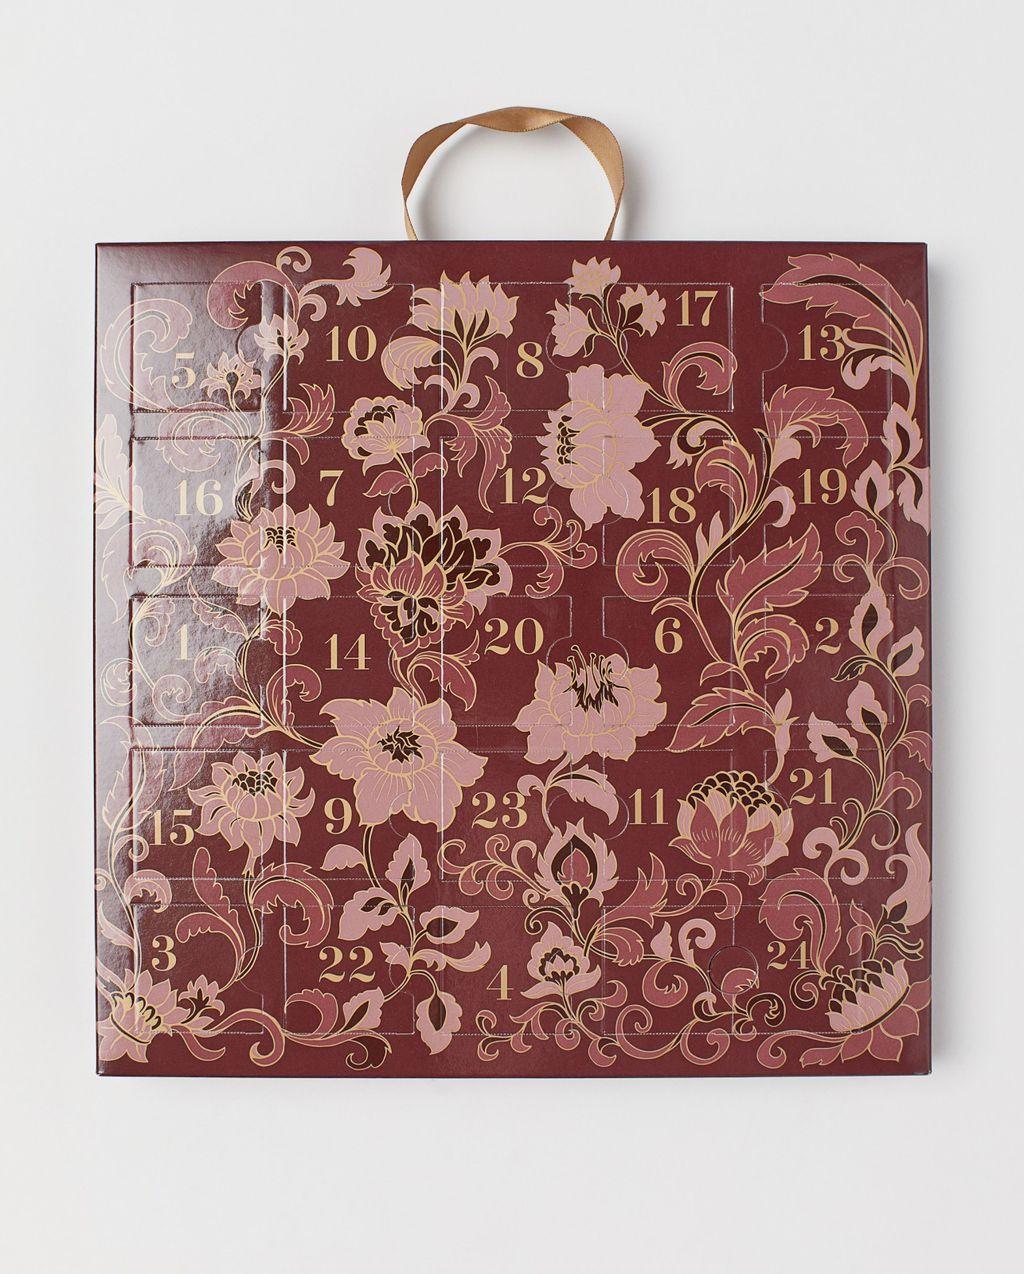 Adventski kalendar iz H&M-a s nakitom - 3